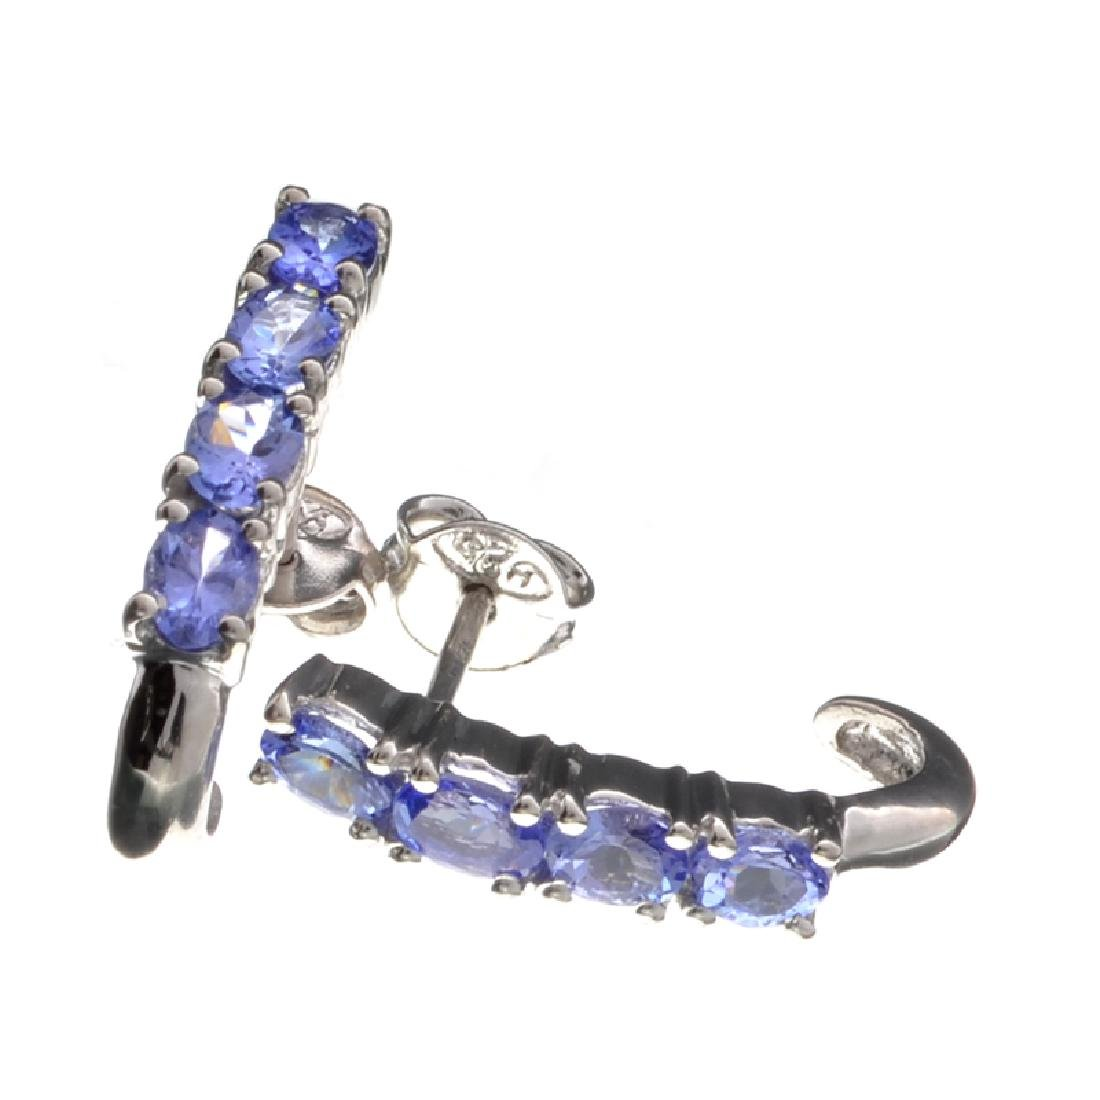 APP: 1k Fine Jewelry 1.03CT Oval Cut Tanzanite And